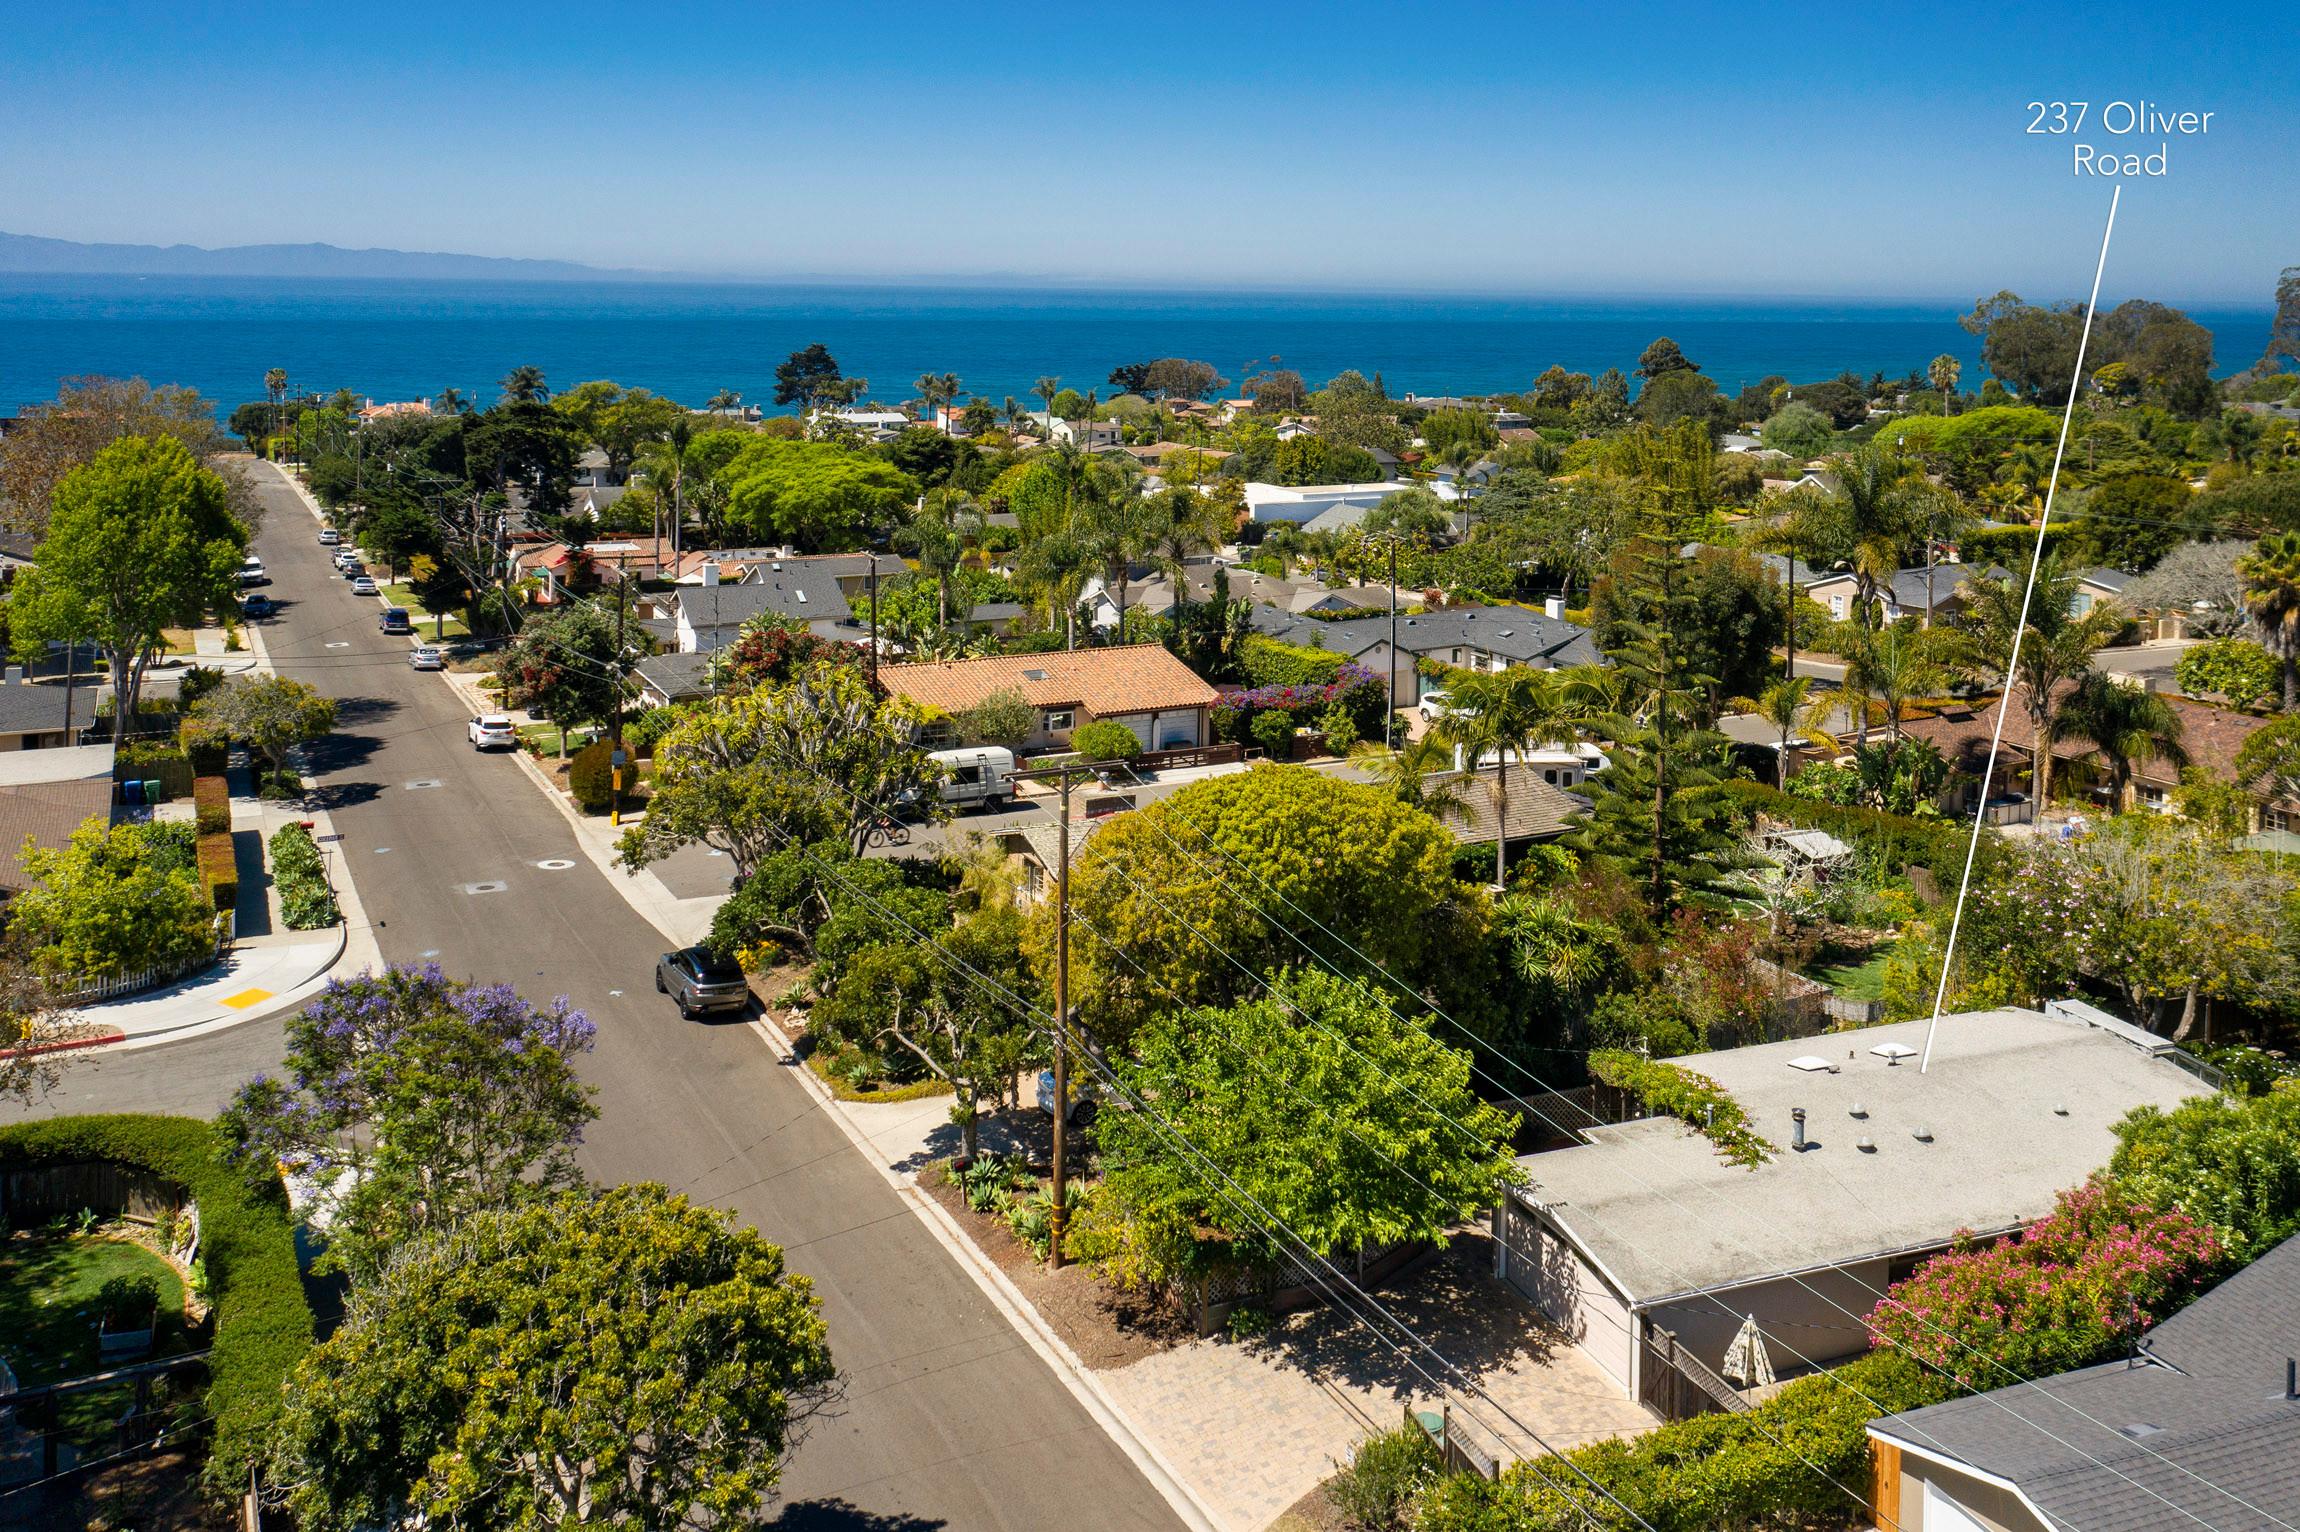 237 Oliver Road, Santa Barbara